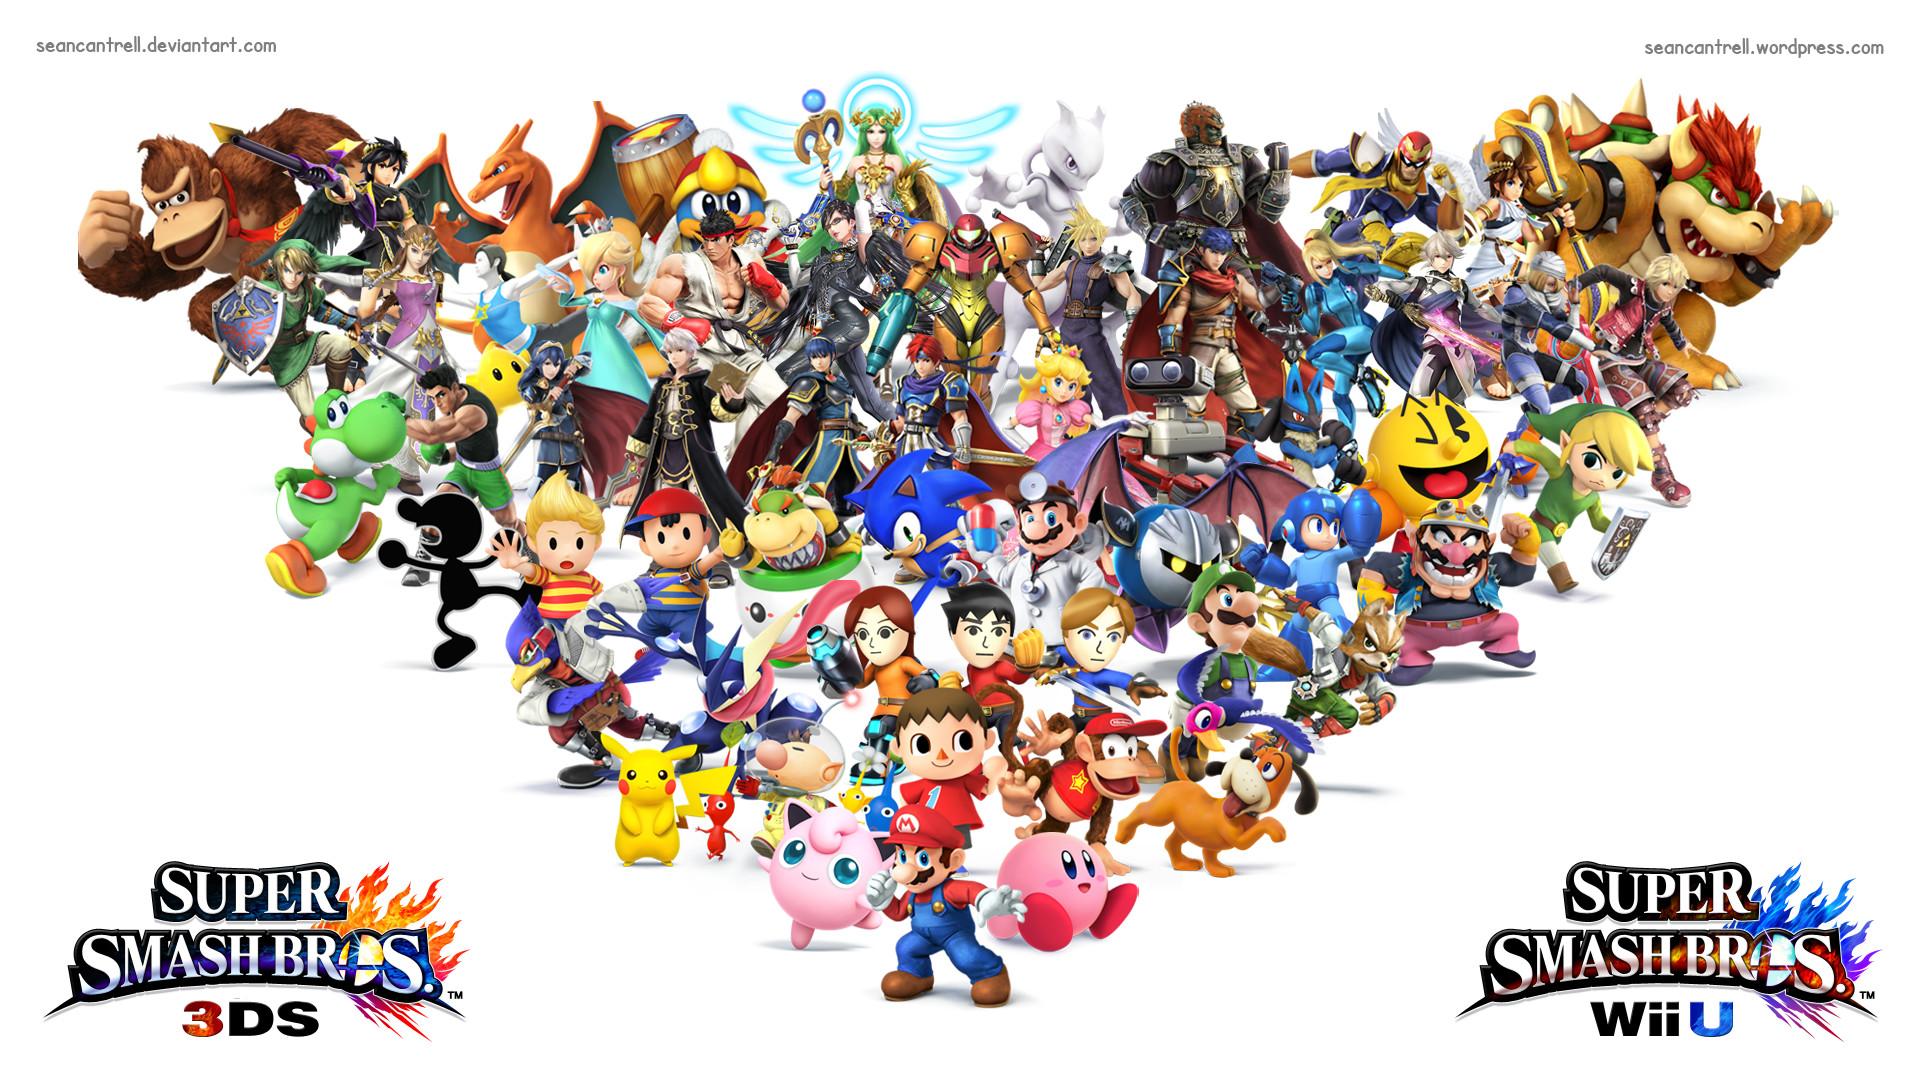 … Super Smash Bros Wii U / 3DS Wallpaper by seancantrell